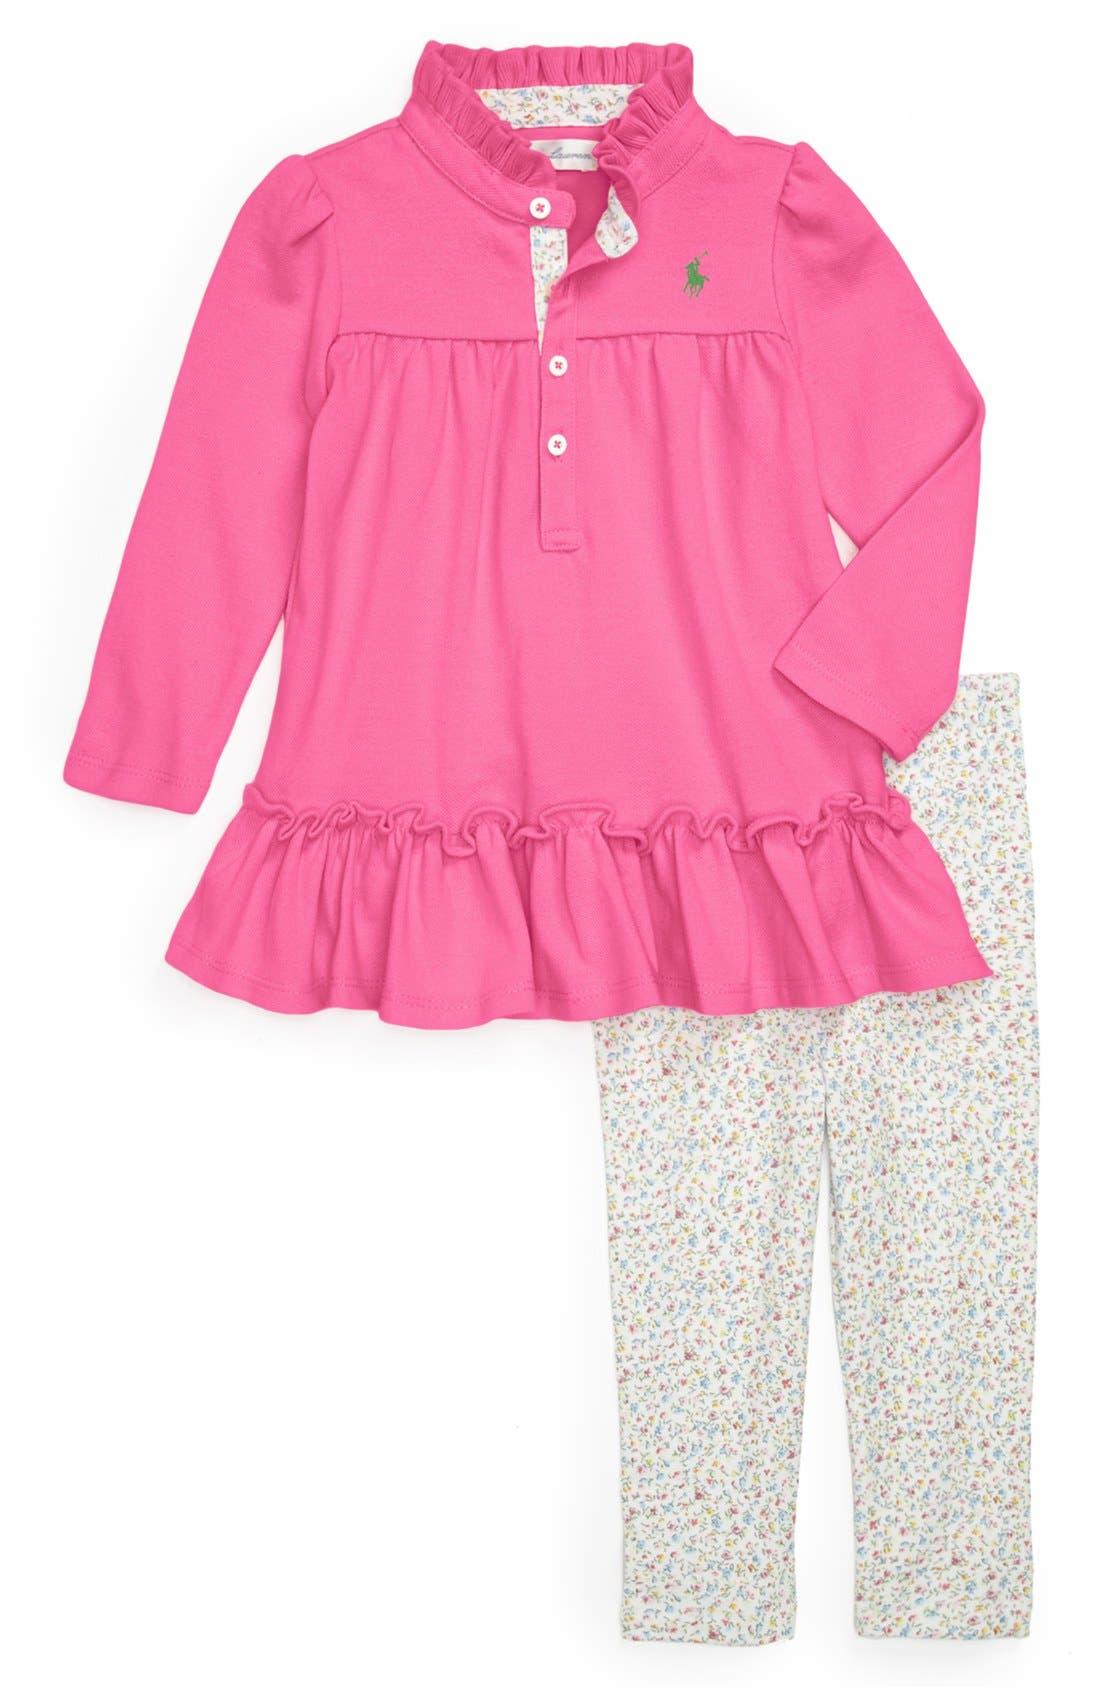 Alternate Image 1 Selected - Ralph Lauren Dress & Leggings (Baby Girls)